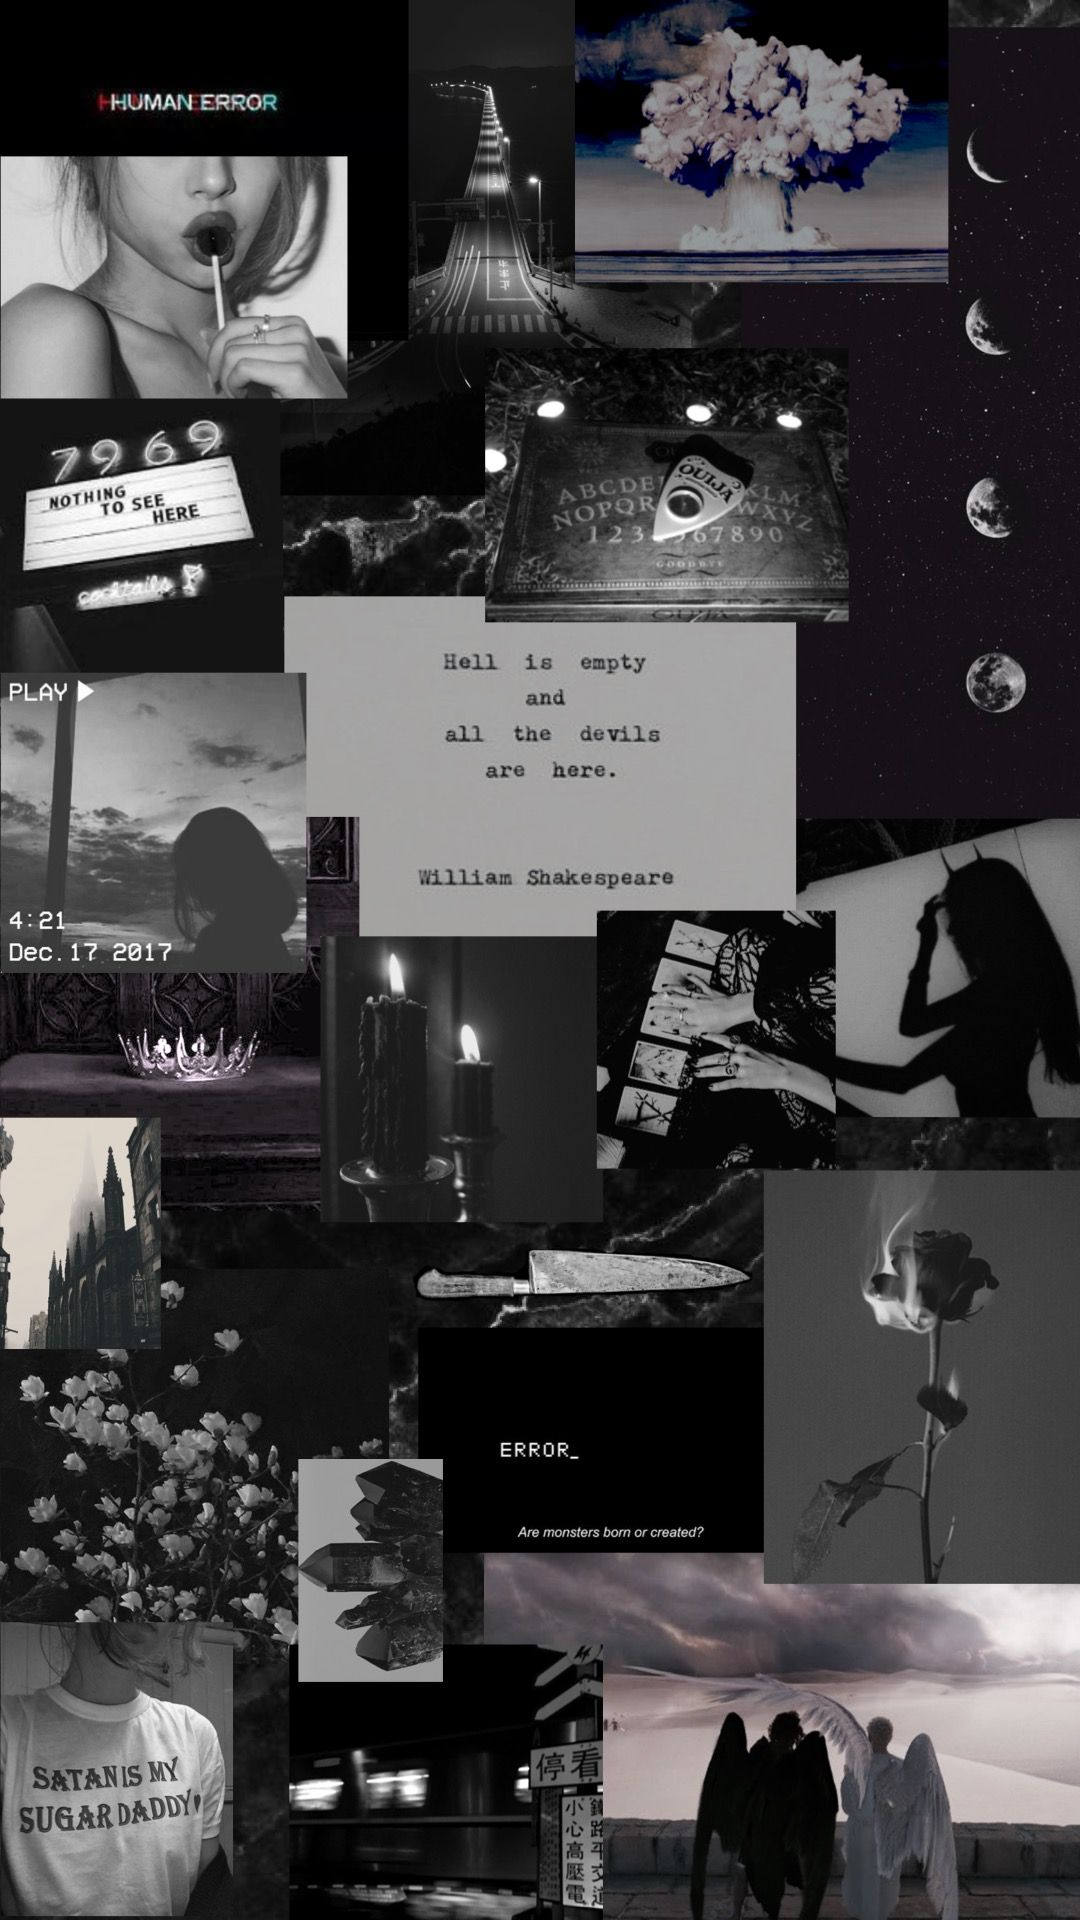 Black Collage Wallpaper : black, collage, wallpaper, SBT🕊, (@bikinisaint), Instagram, Photos, Videos, Wallpaper,, Black, Aesthetic, Wallpapers